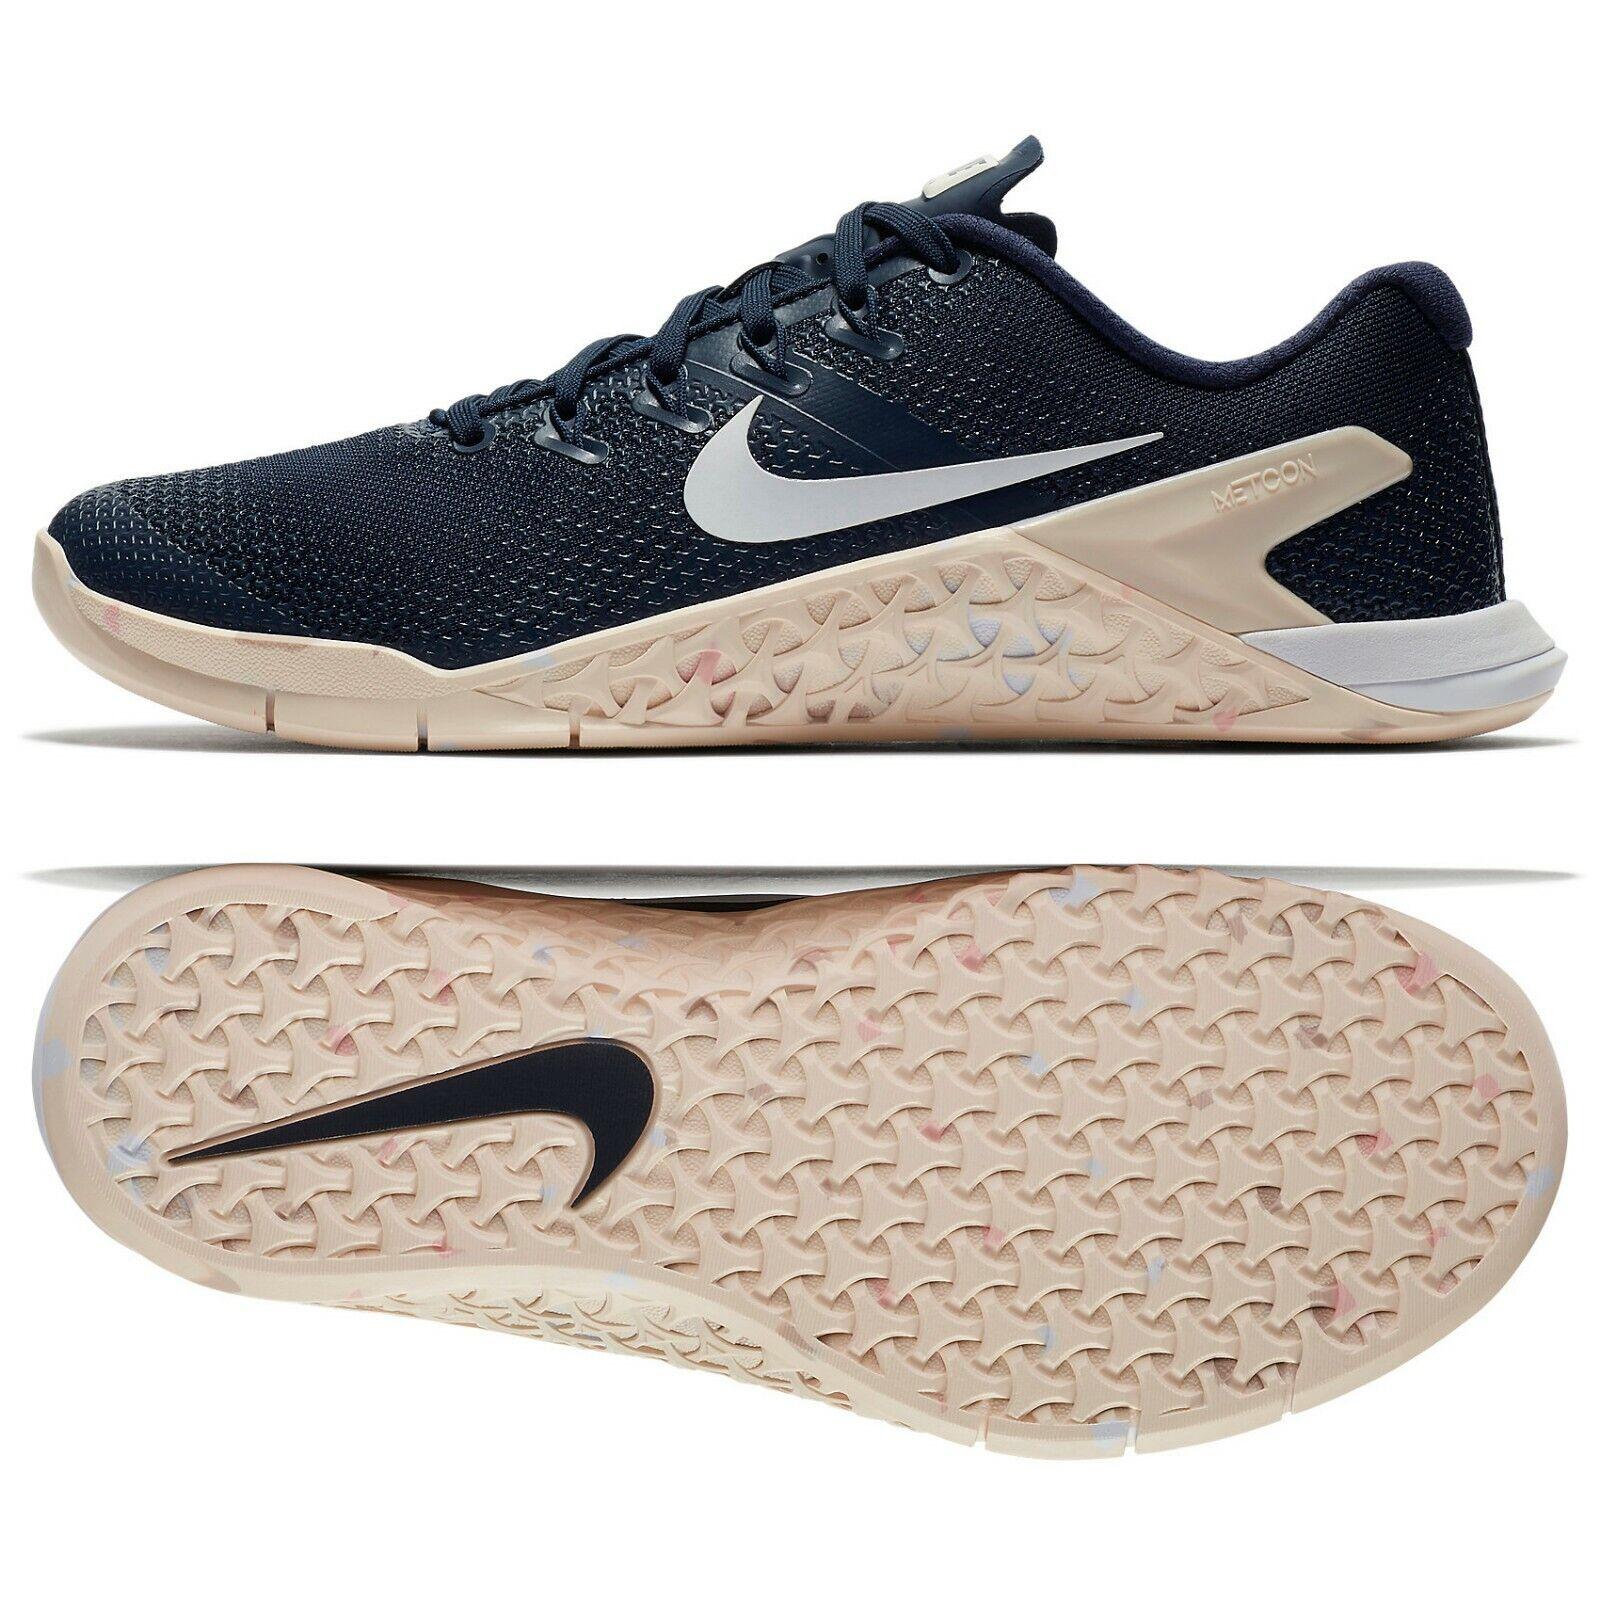 Nike WMNS Metcon 4 924593-402 Obsidian White Pink Women's Training shoes